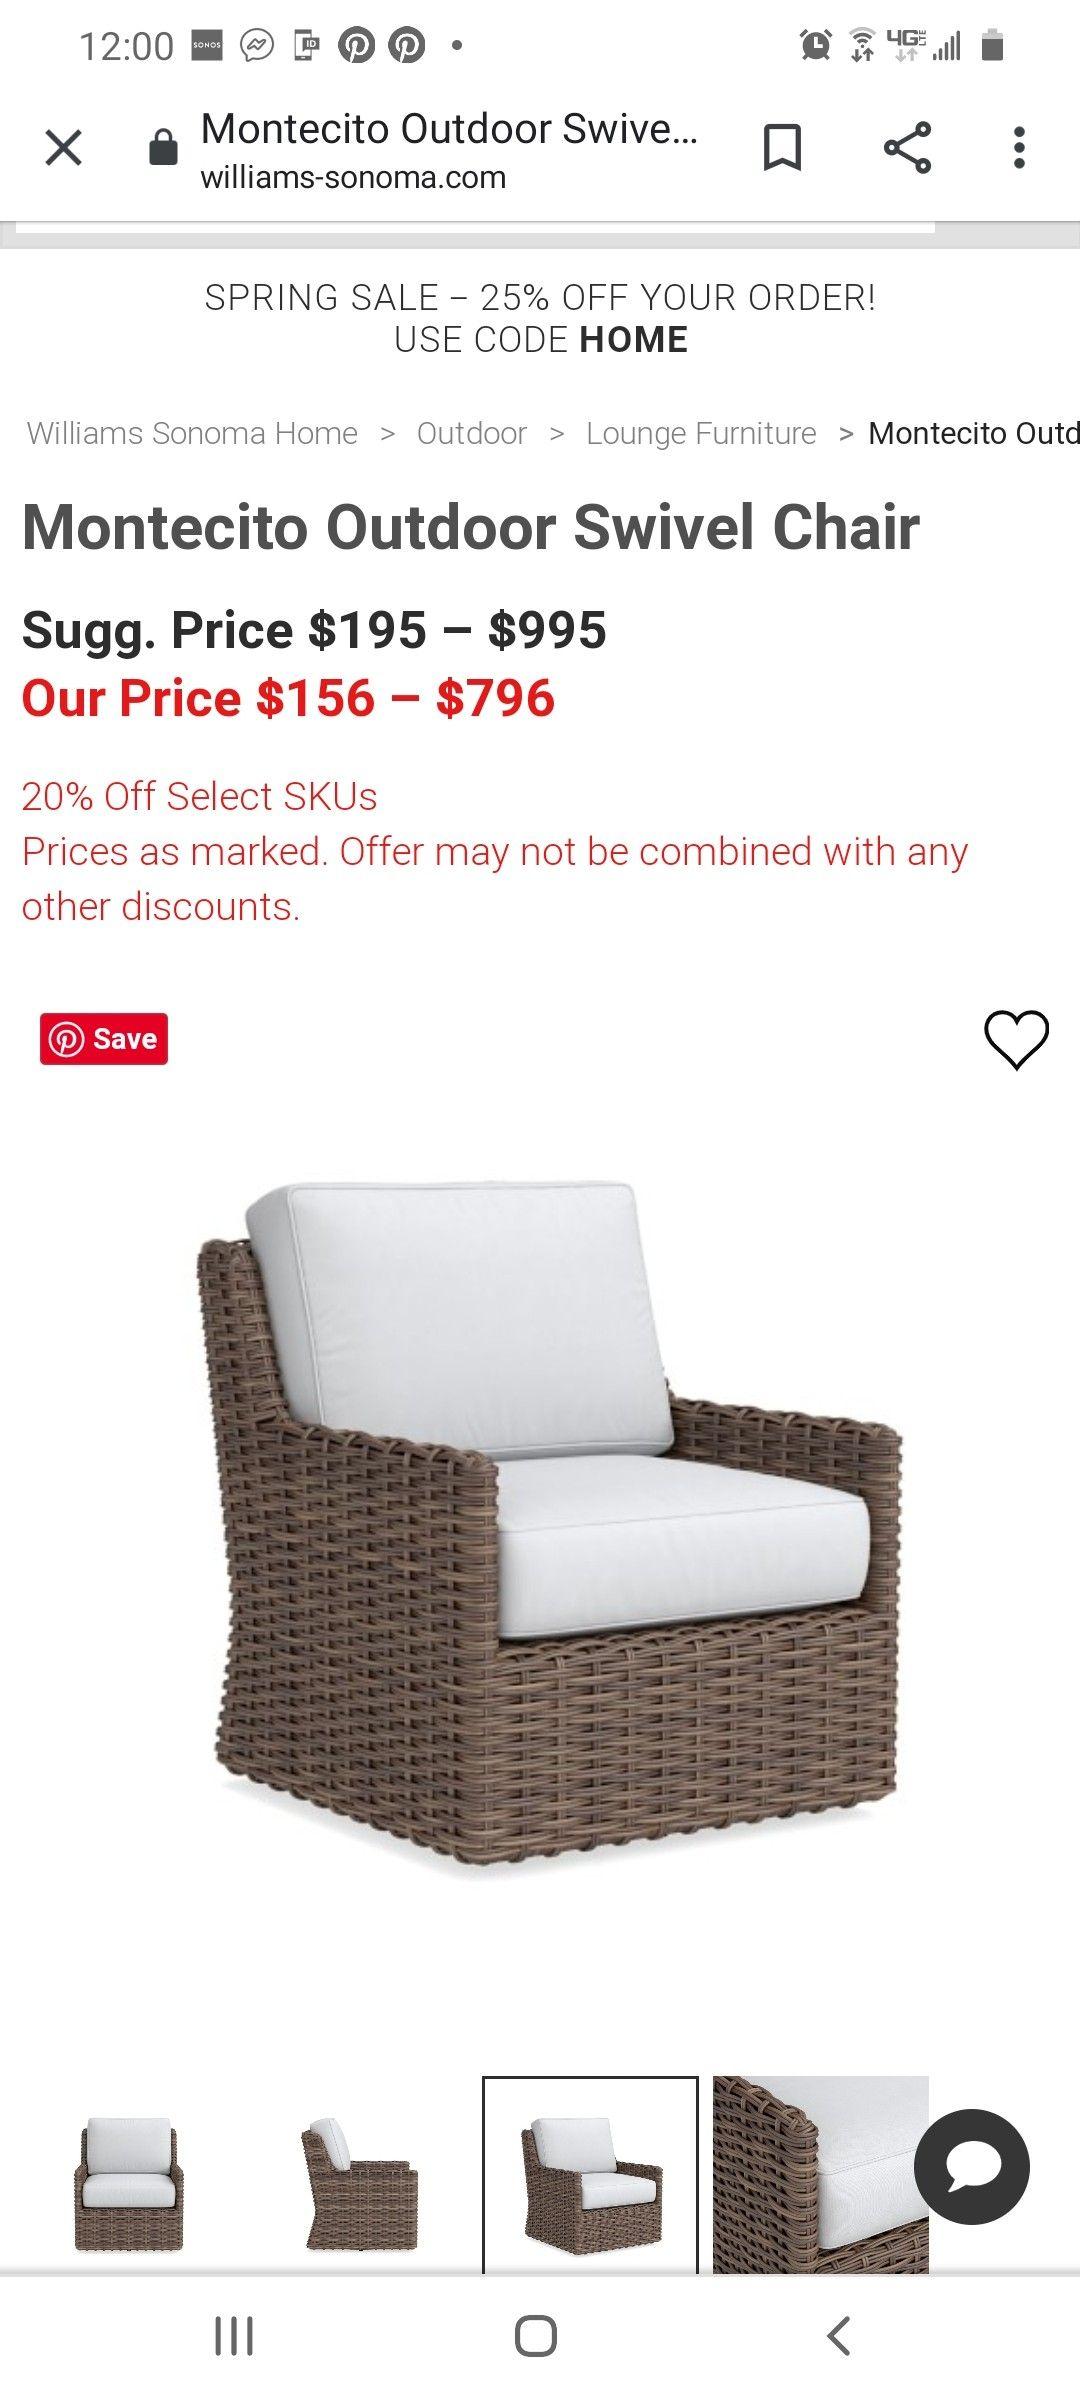 Williams Sonoma Outdoor Furniture Sale